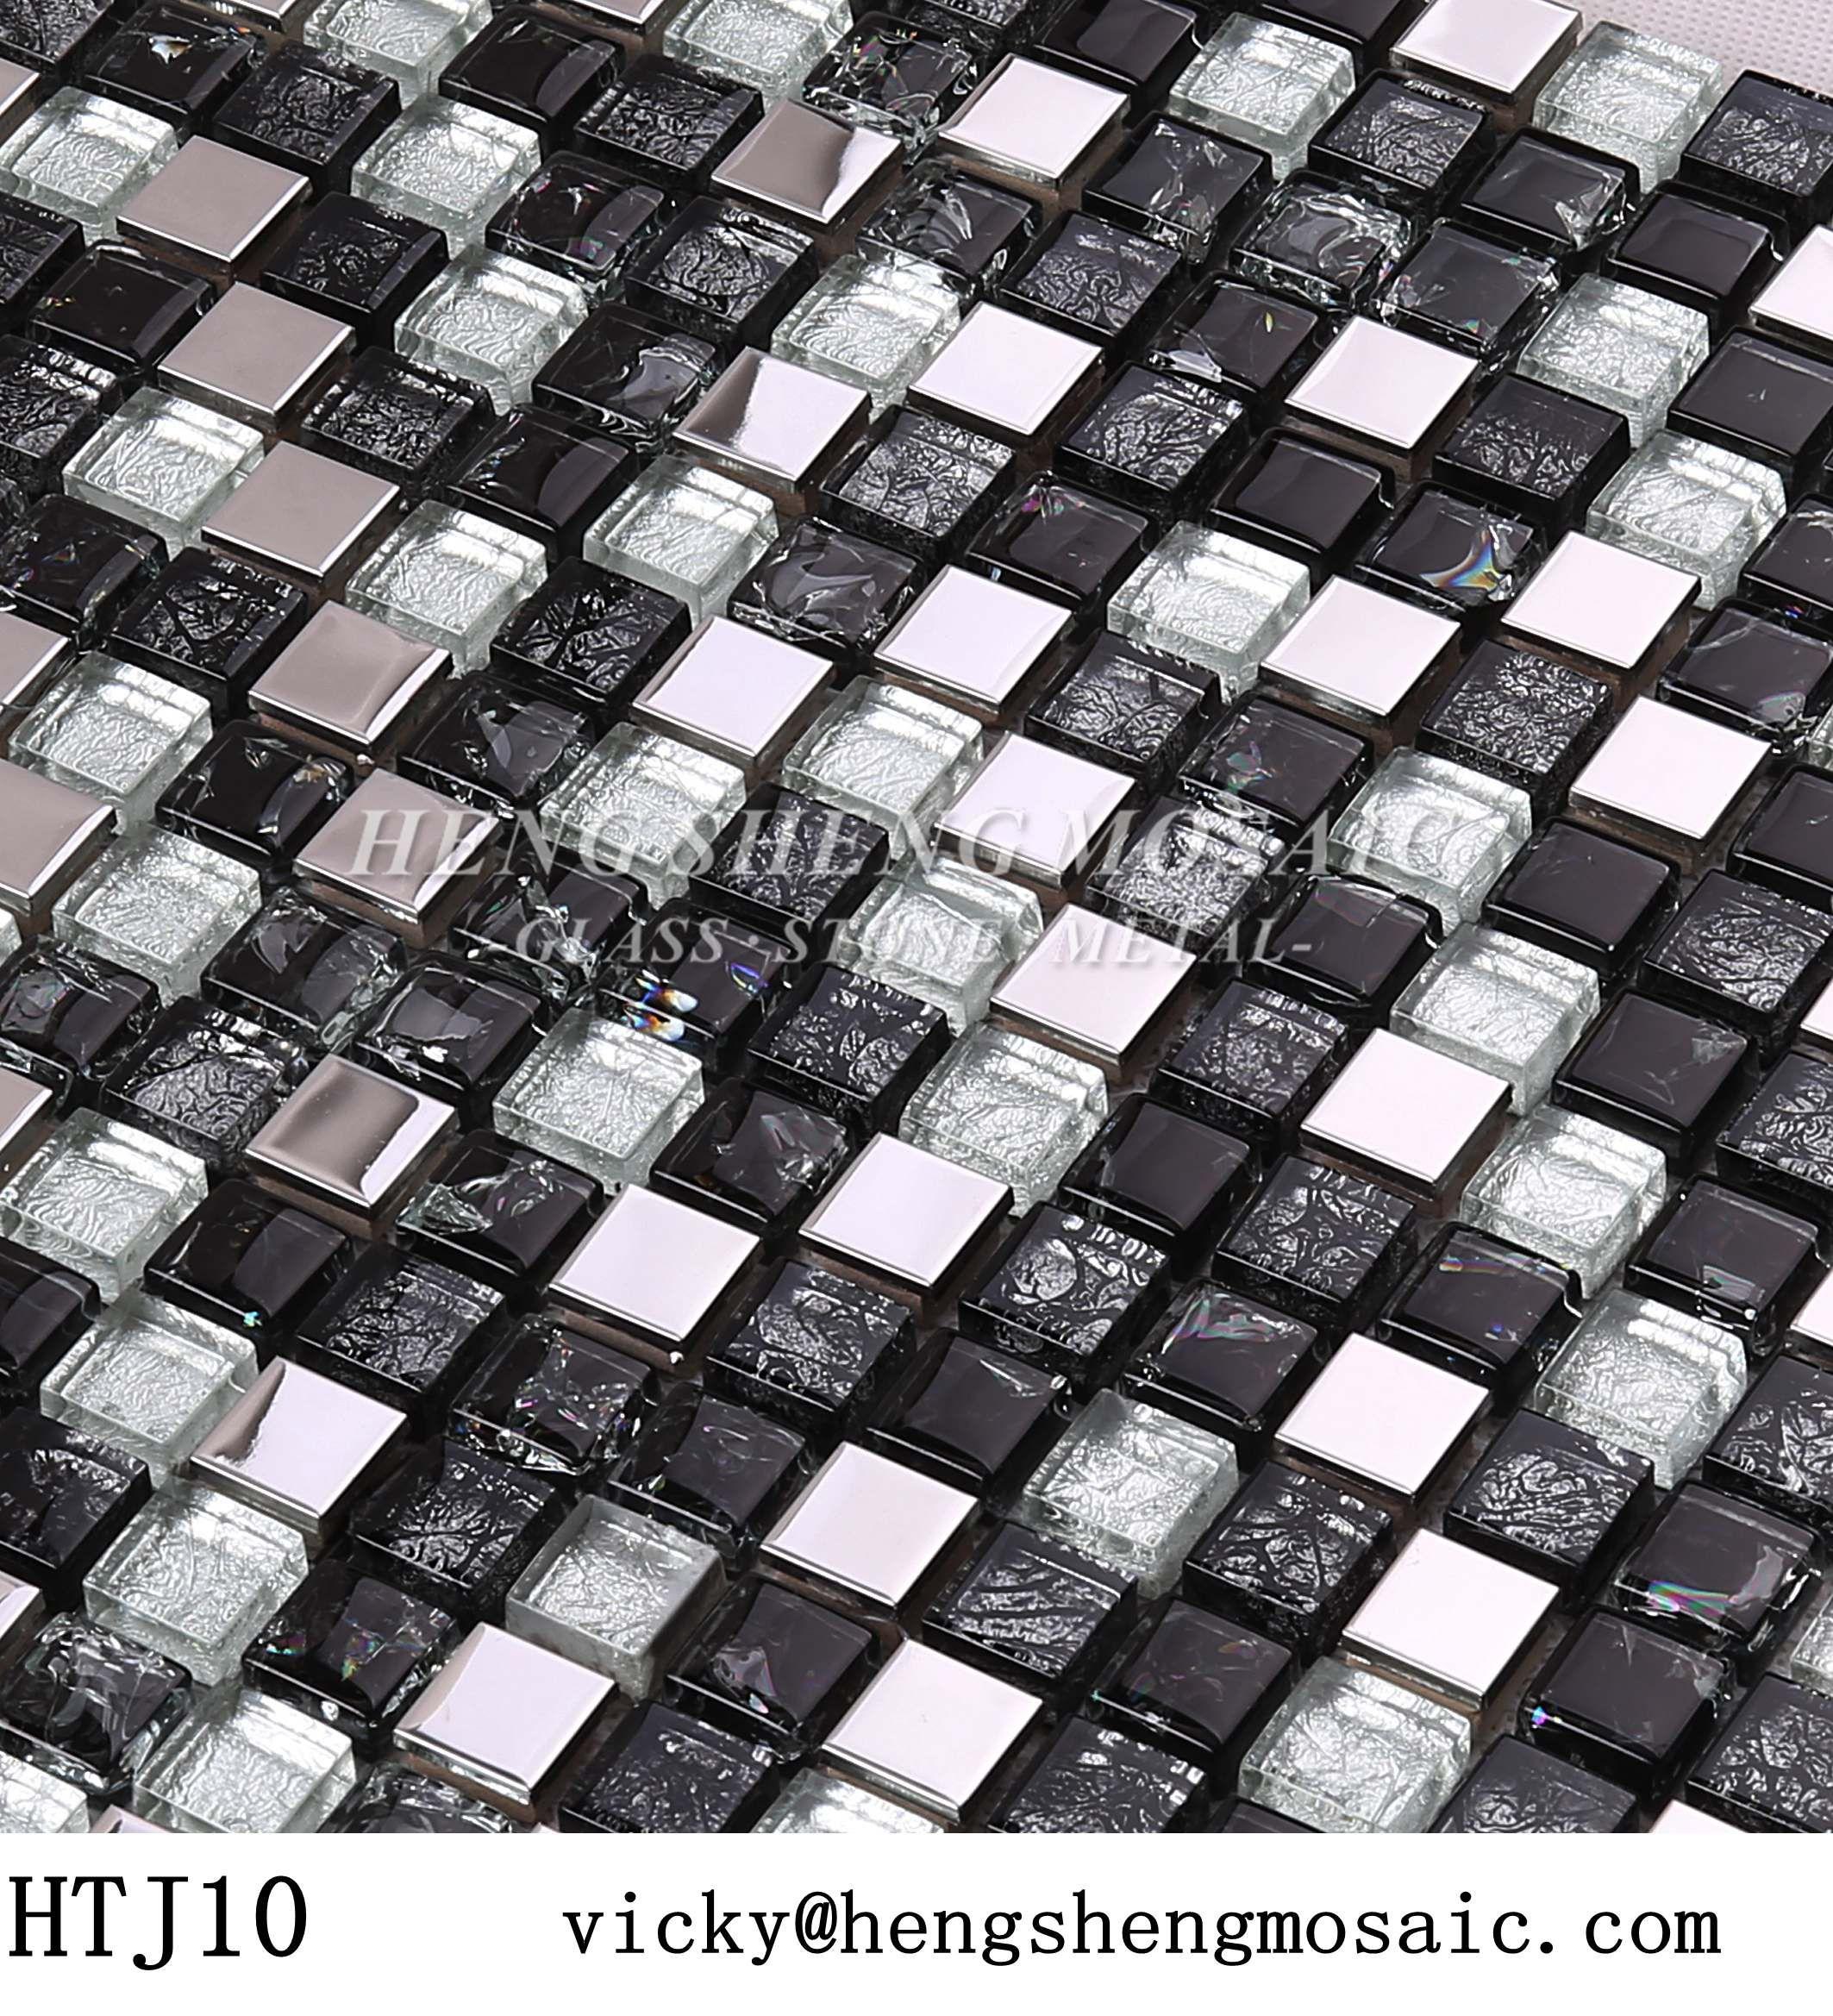 Classical Mini Glass Gold Foiled Mix Metal Stainless Steel Mosaic Tile For Kitchen Backsplash Wall Blacktile Blackmosa Mosaic Glass Black Mosaic Black Tiles